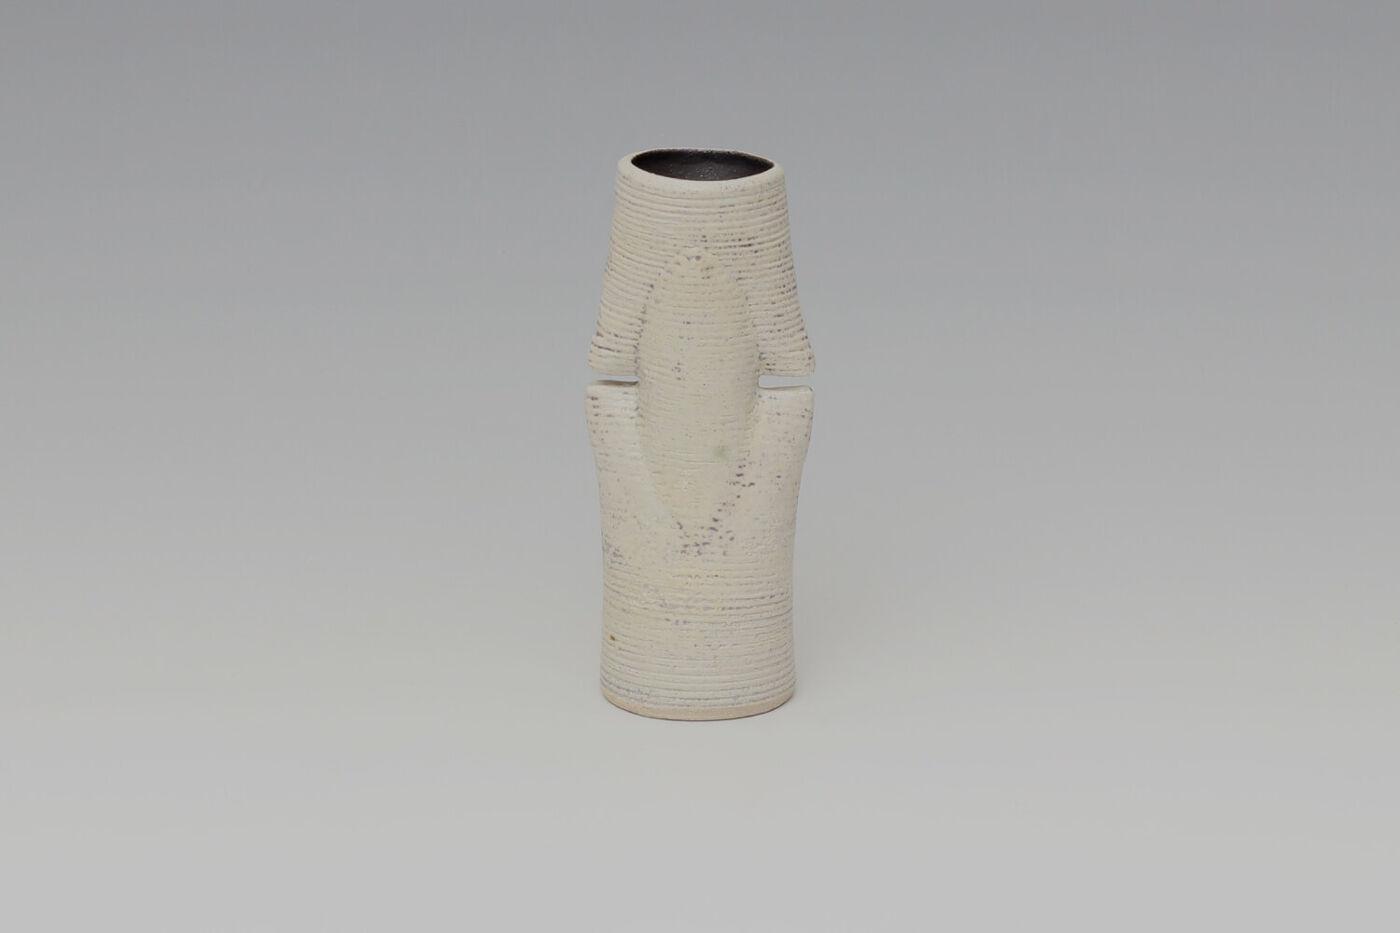 Chris Carter Ceramic Double Totemic Form 151